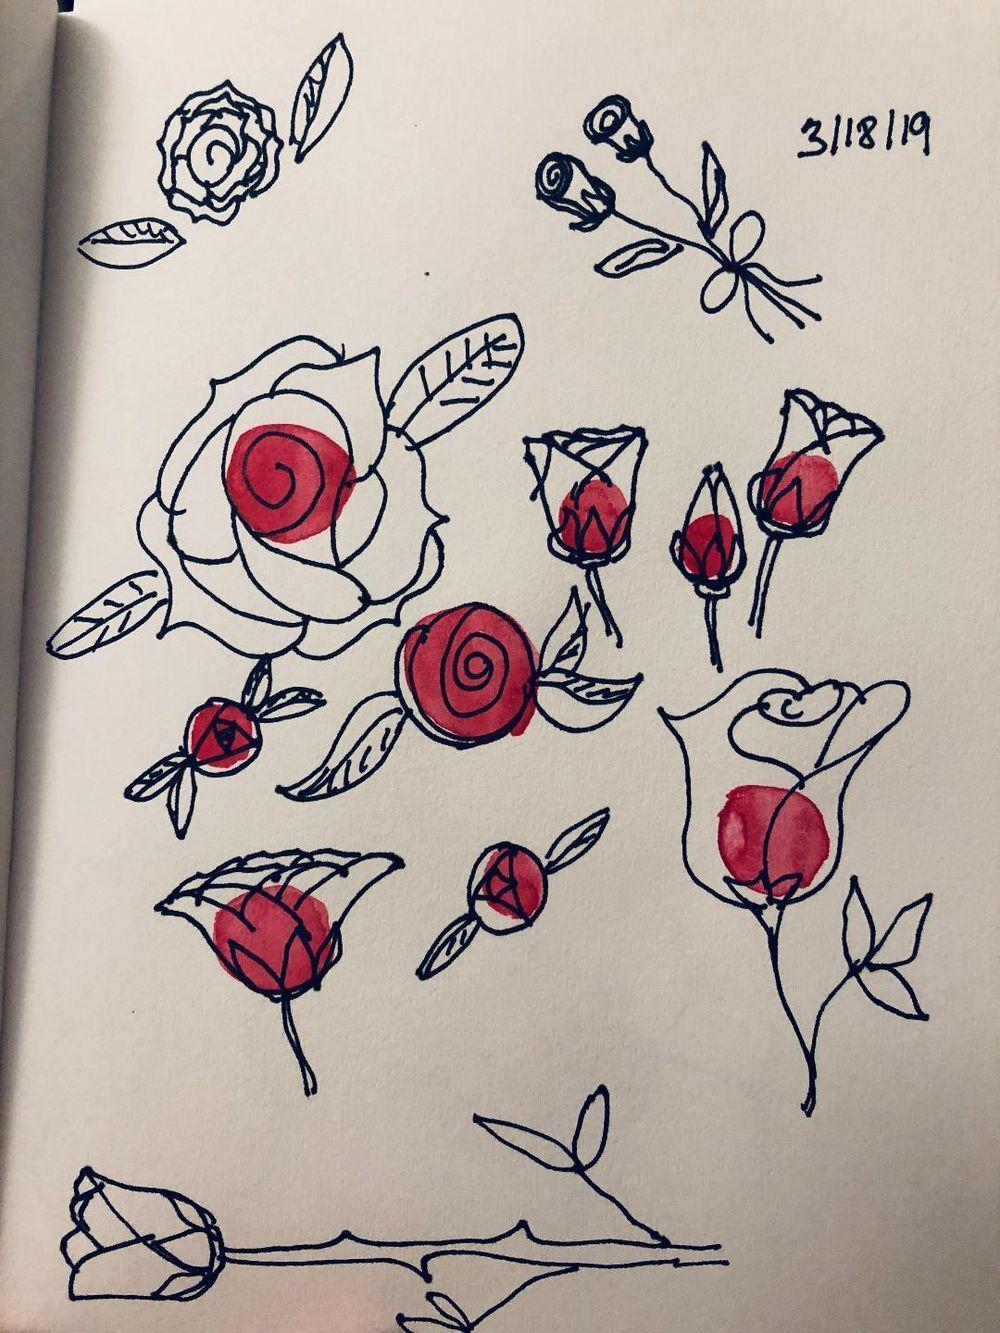 Exploring sketchbooks - image 1 - student project